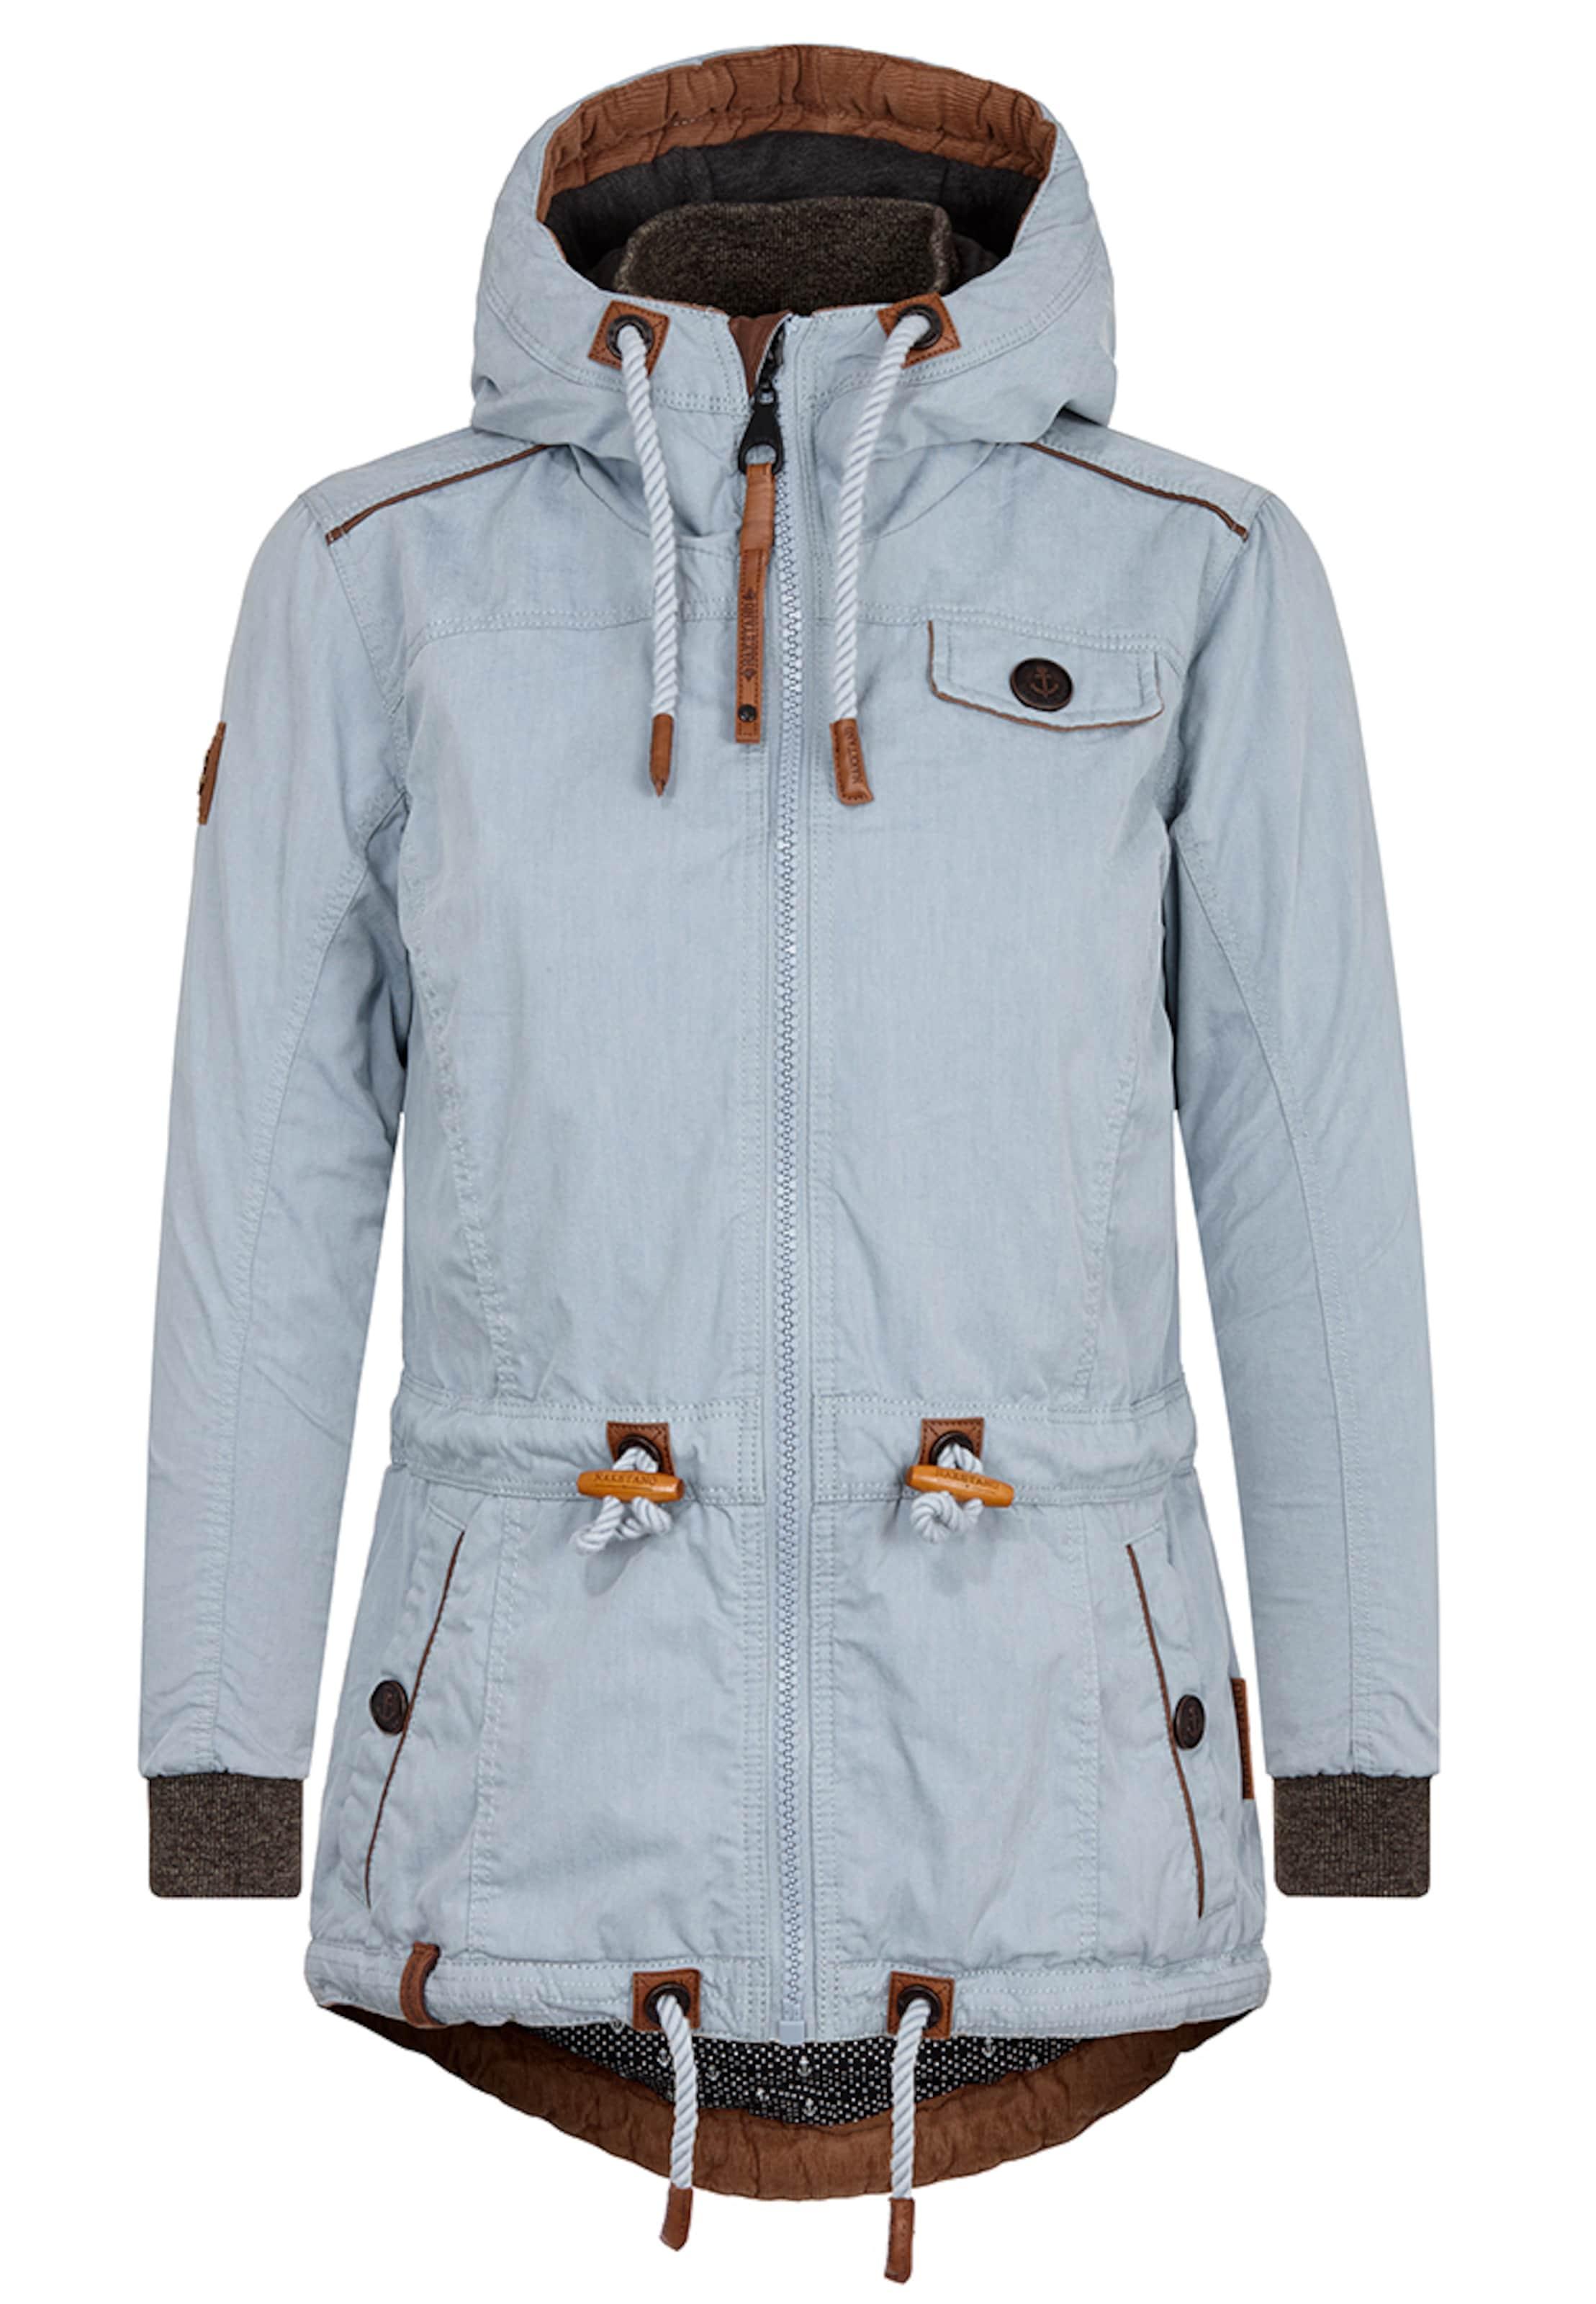 Magic Jacket Stick 'the In Rauchblau Pimmel' Naketano ZTPukOXi